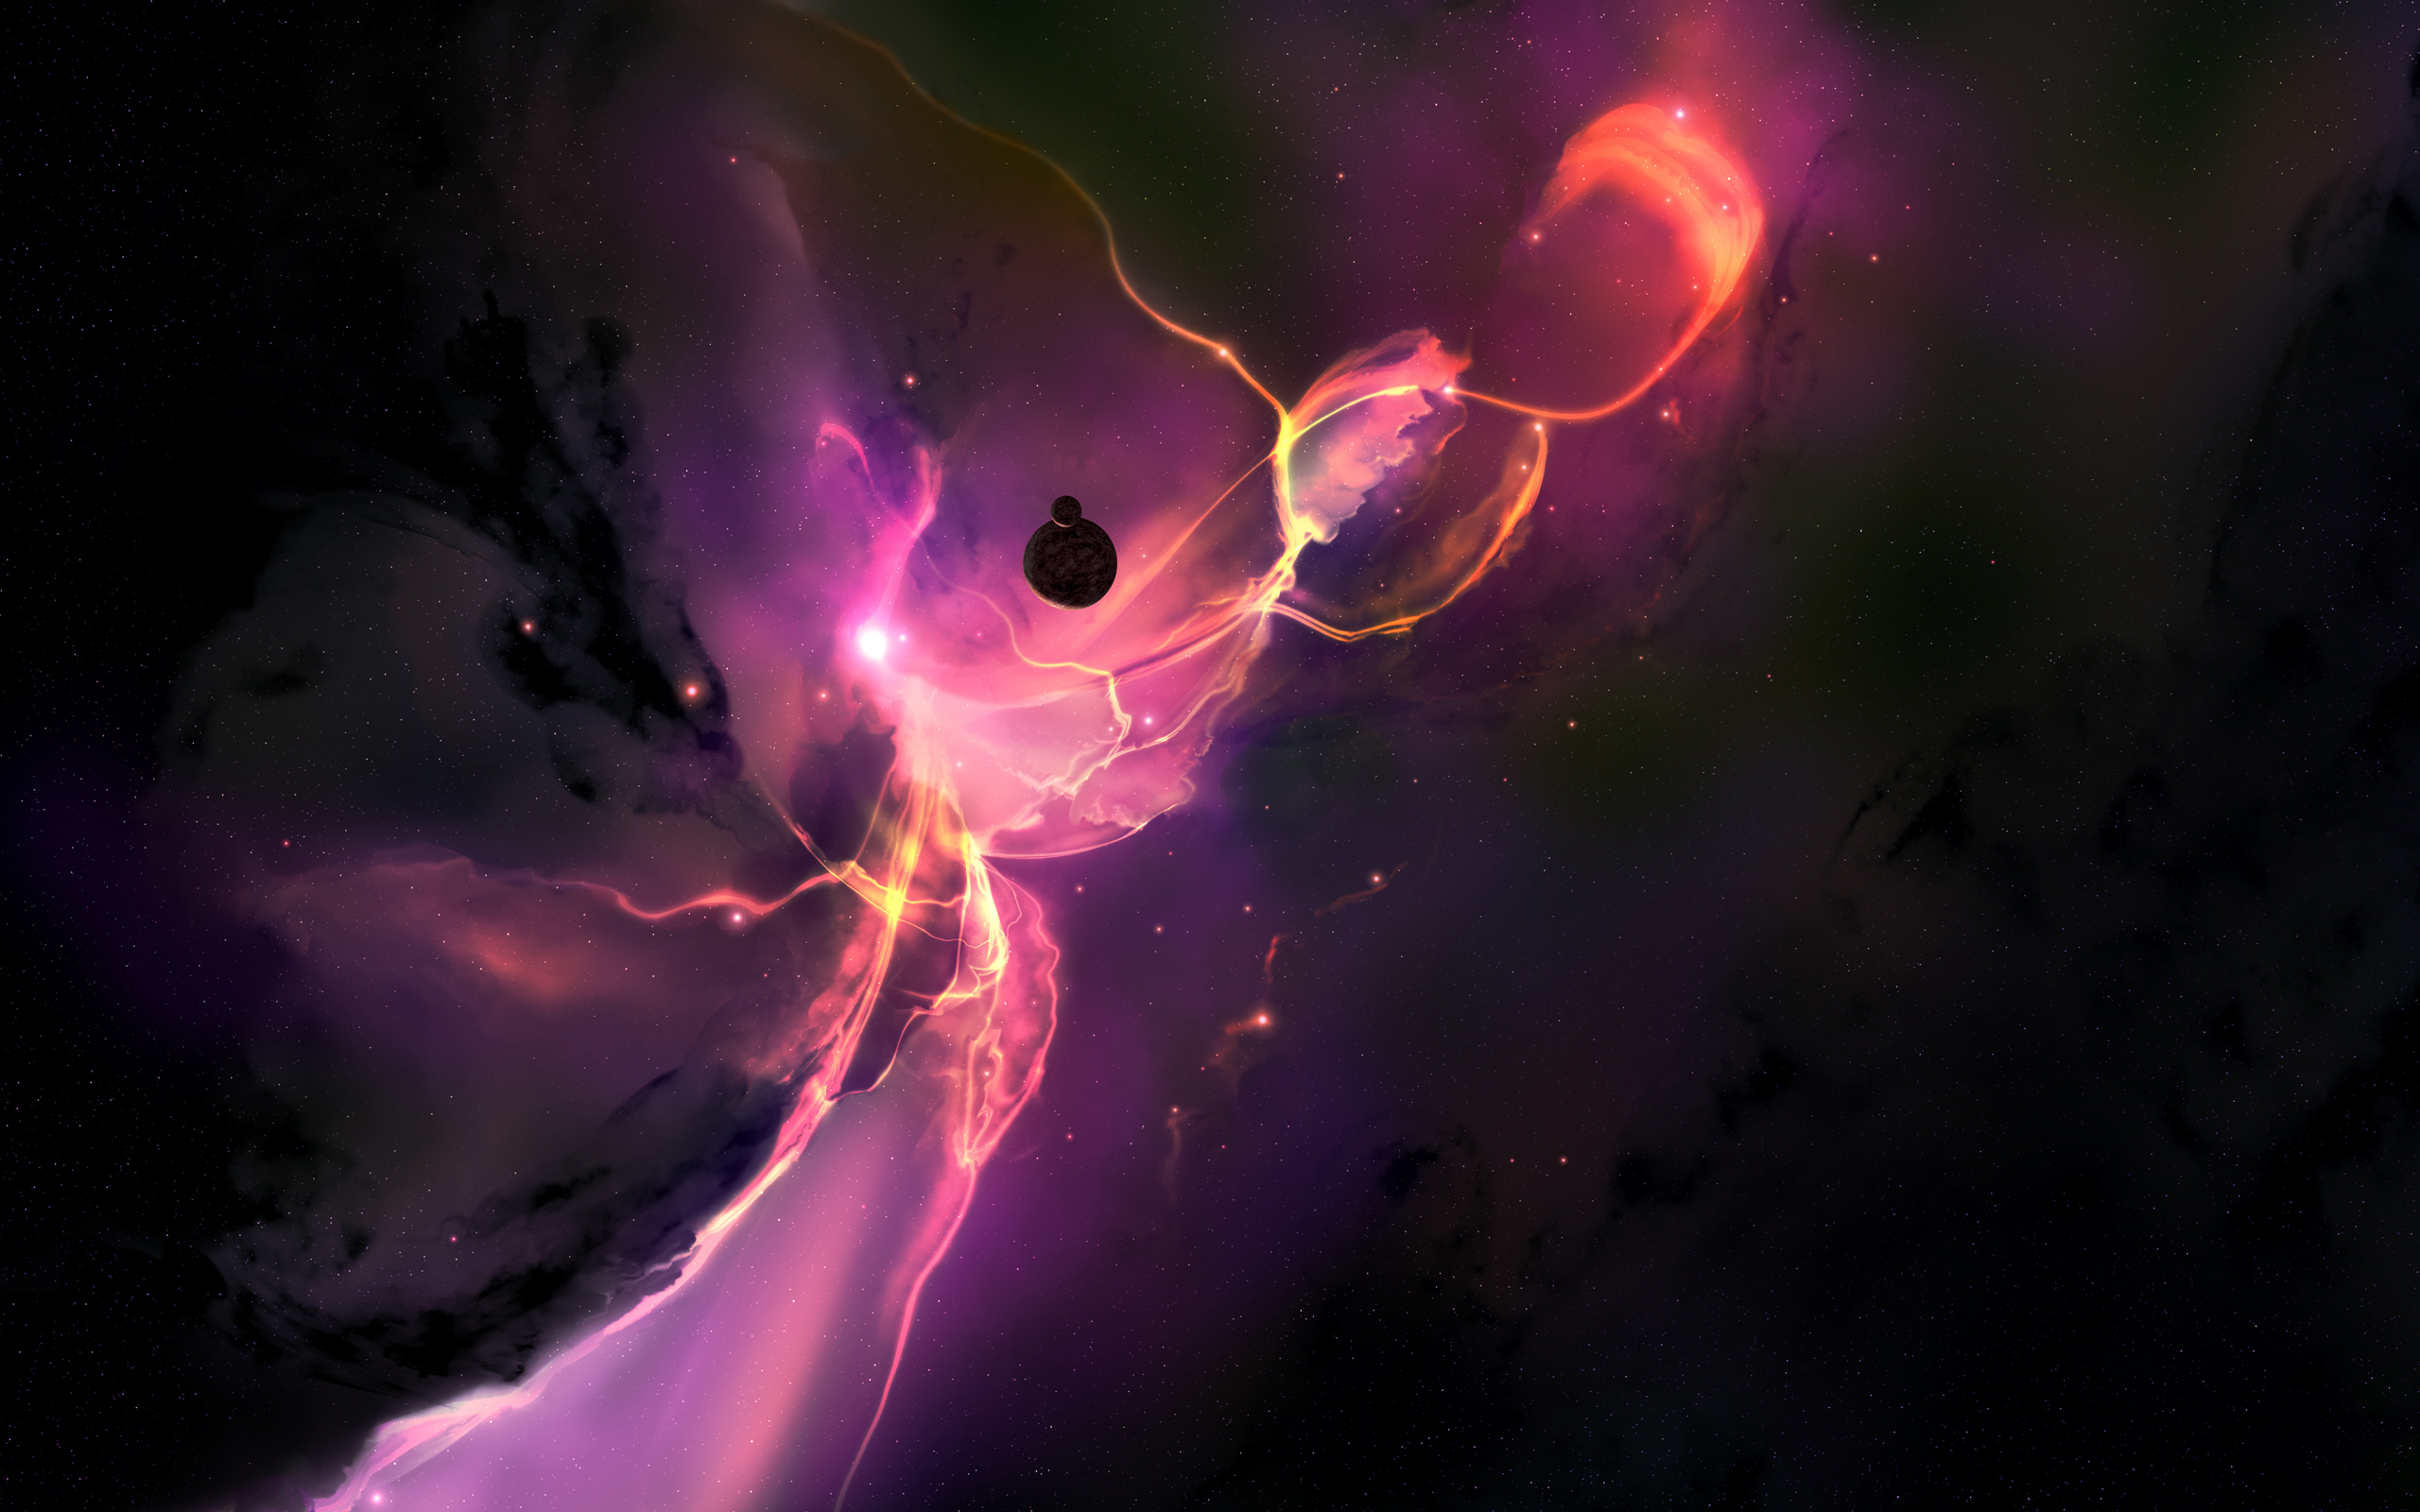 Purple space artwork